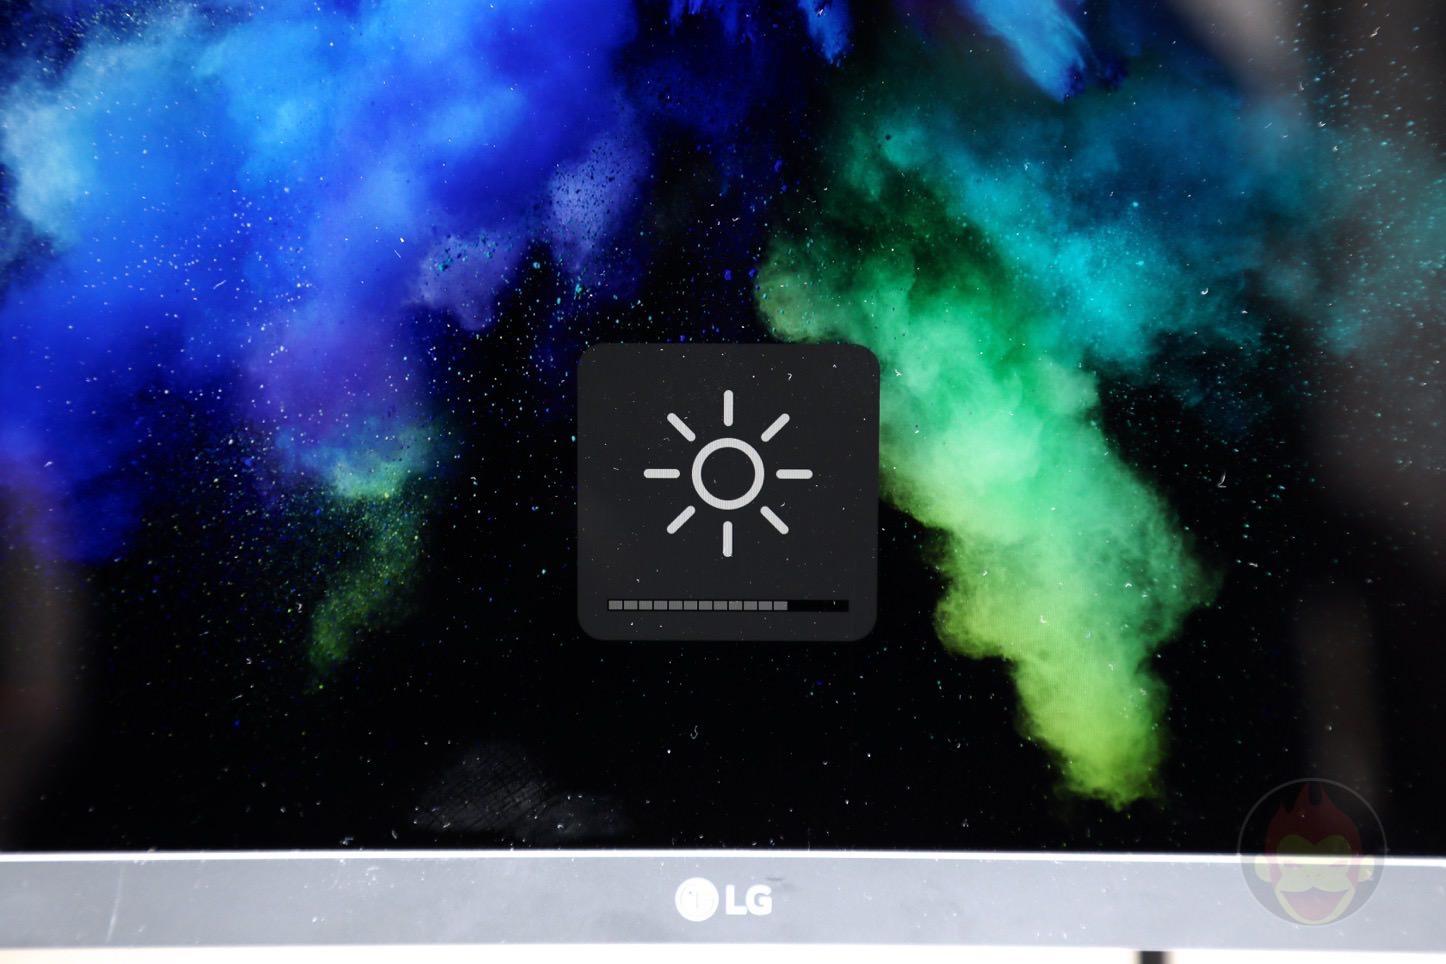 LG-5K-UltraFine-Display-Review-29.jpg